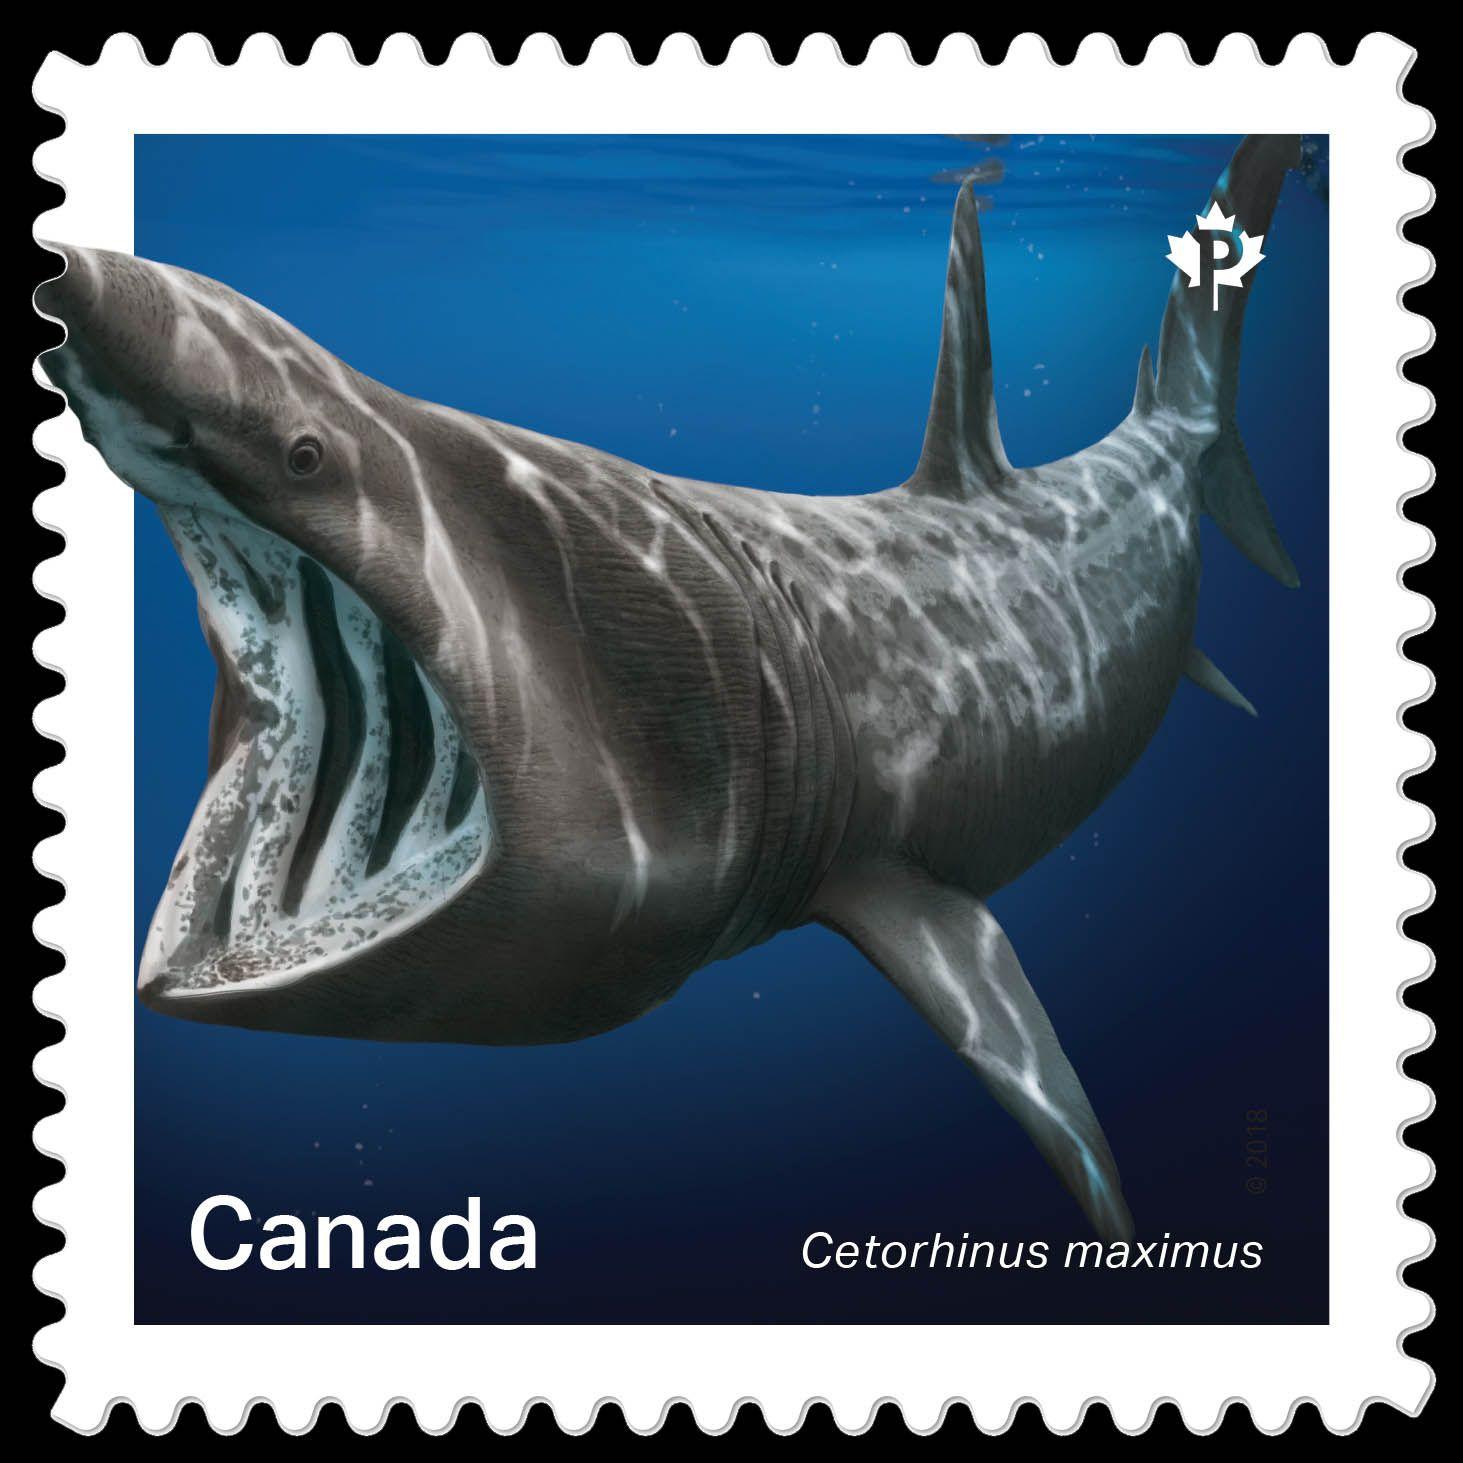 Canada 2018 Sharks In Canadian Water Basking Shark Basking Shark Shark Species Of Sharks